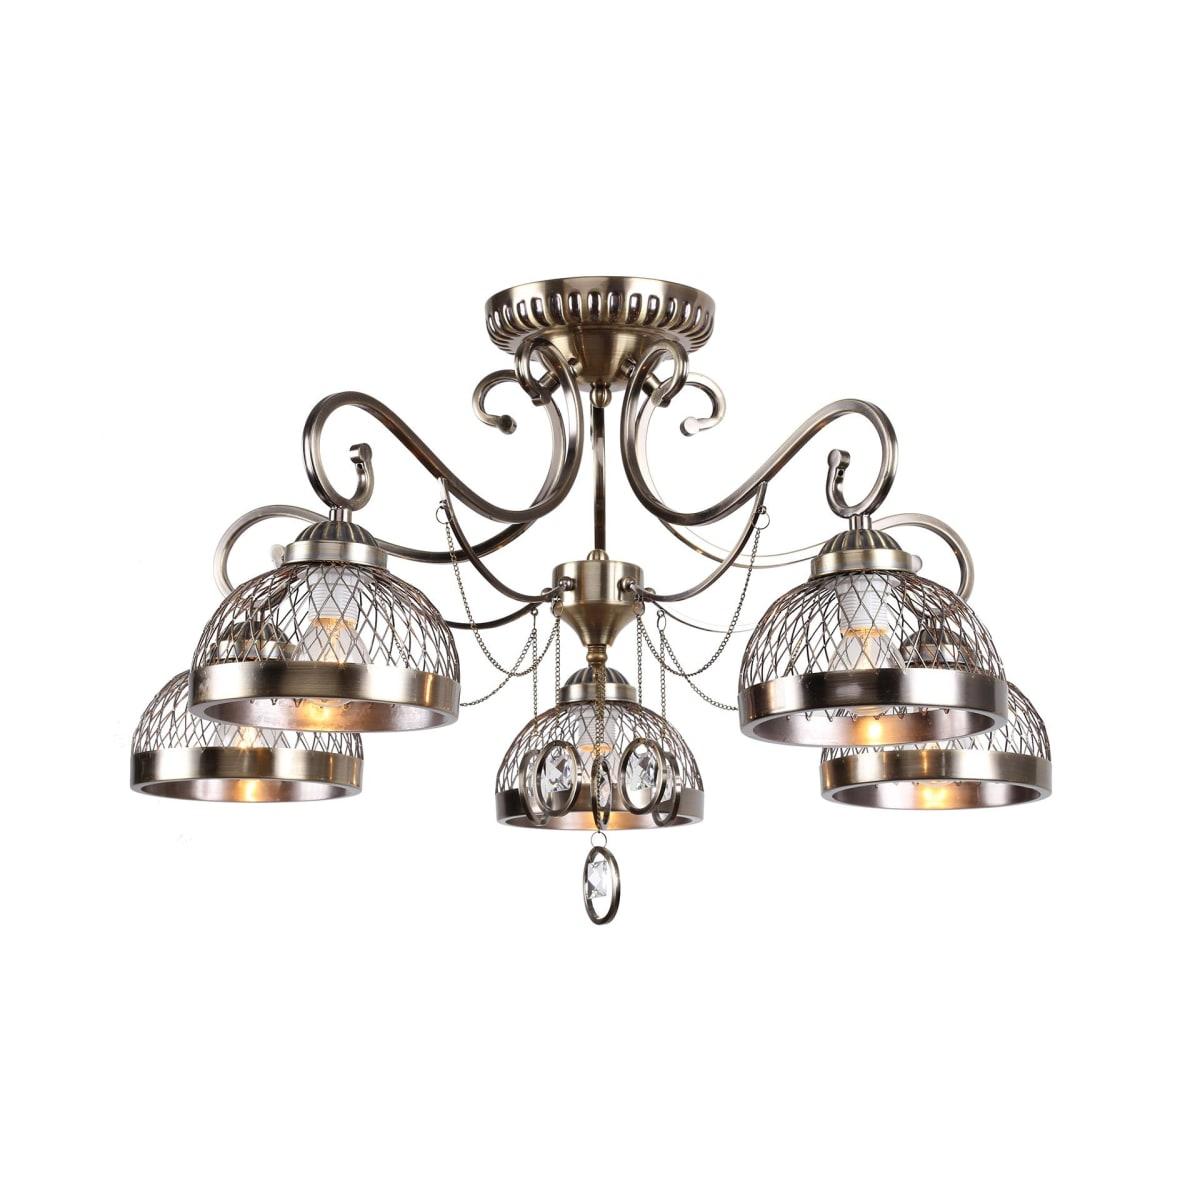 Люстра Rivoli Cofanetto 5032-305 Е27 5 ламп 14 м²